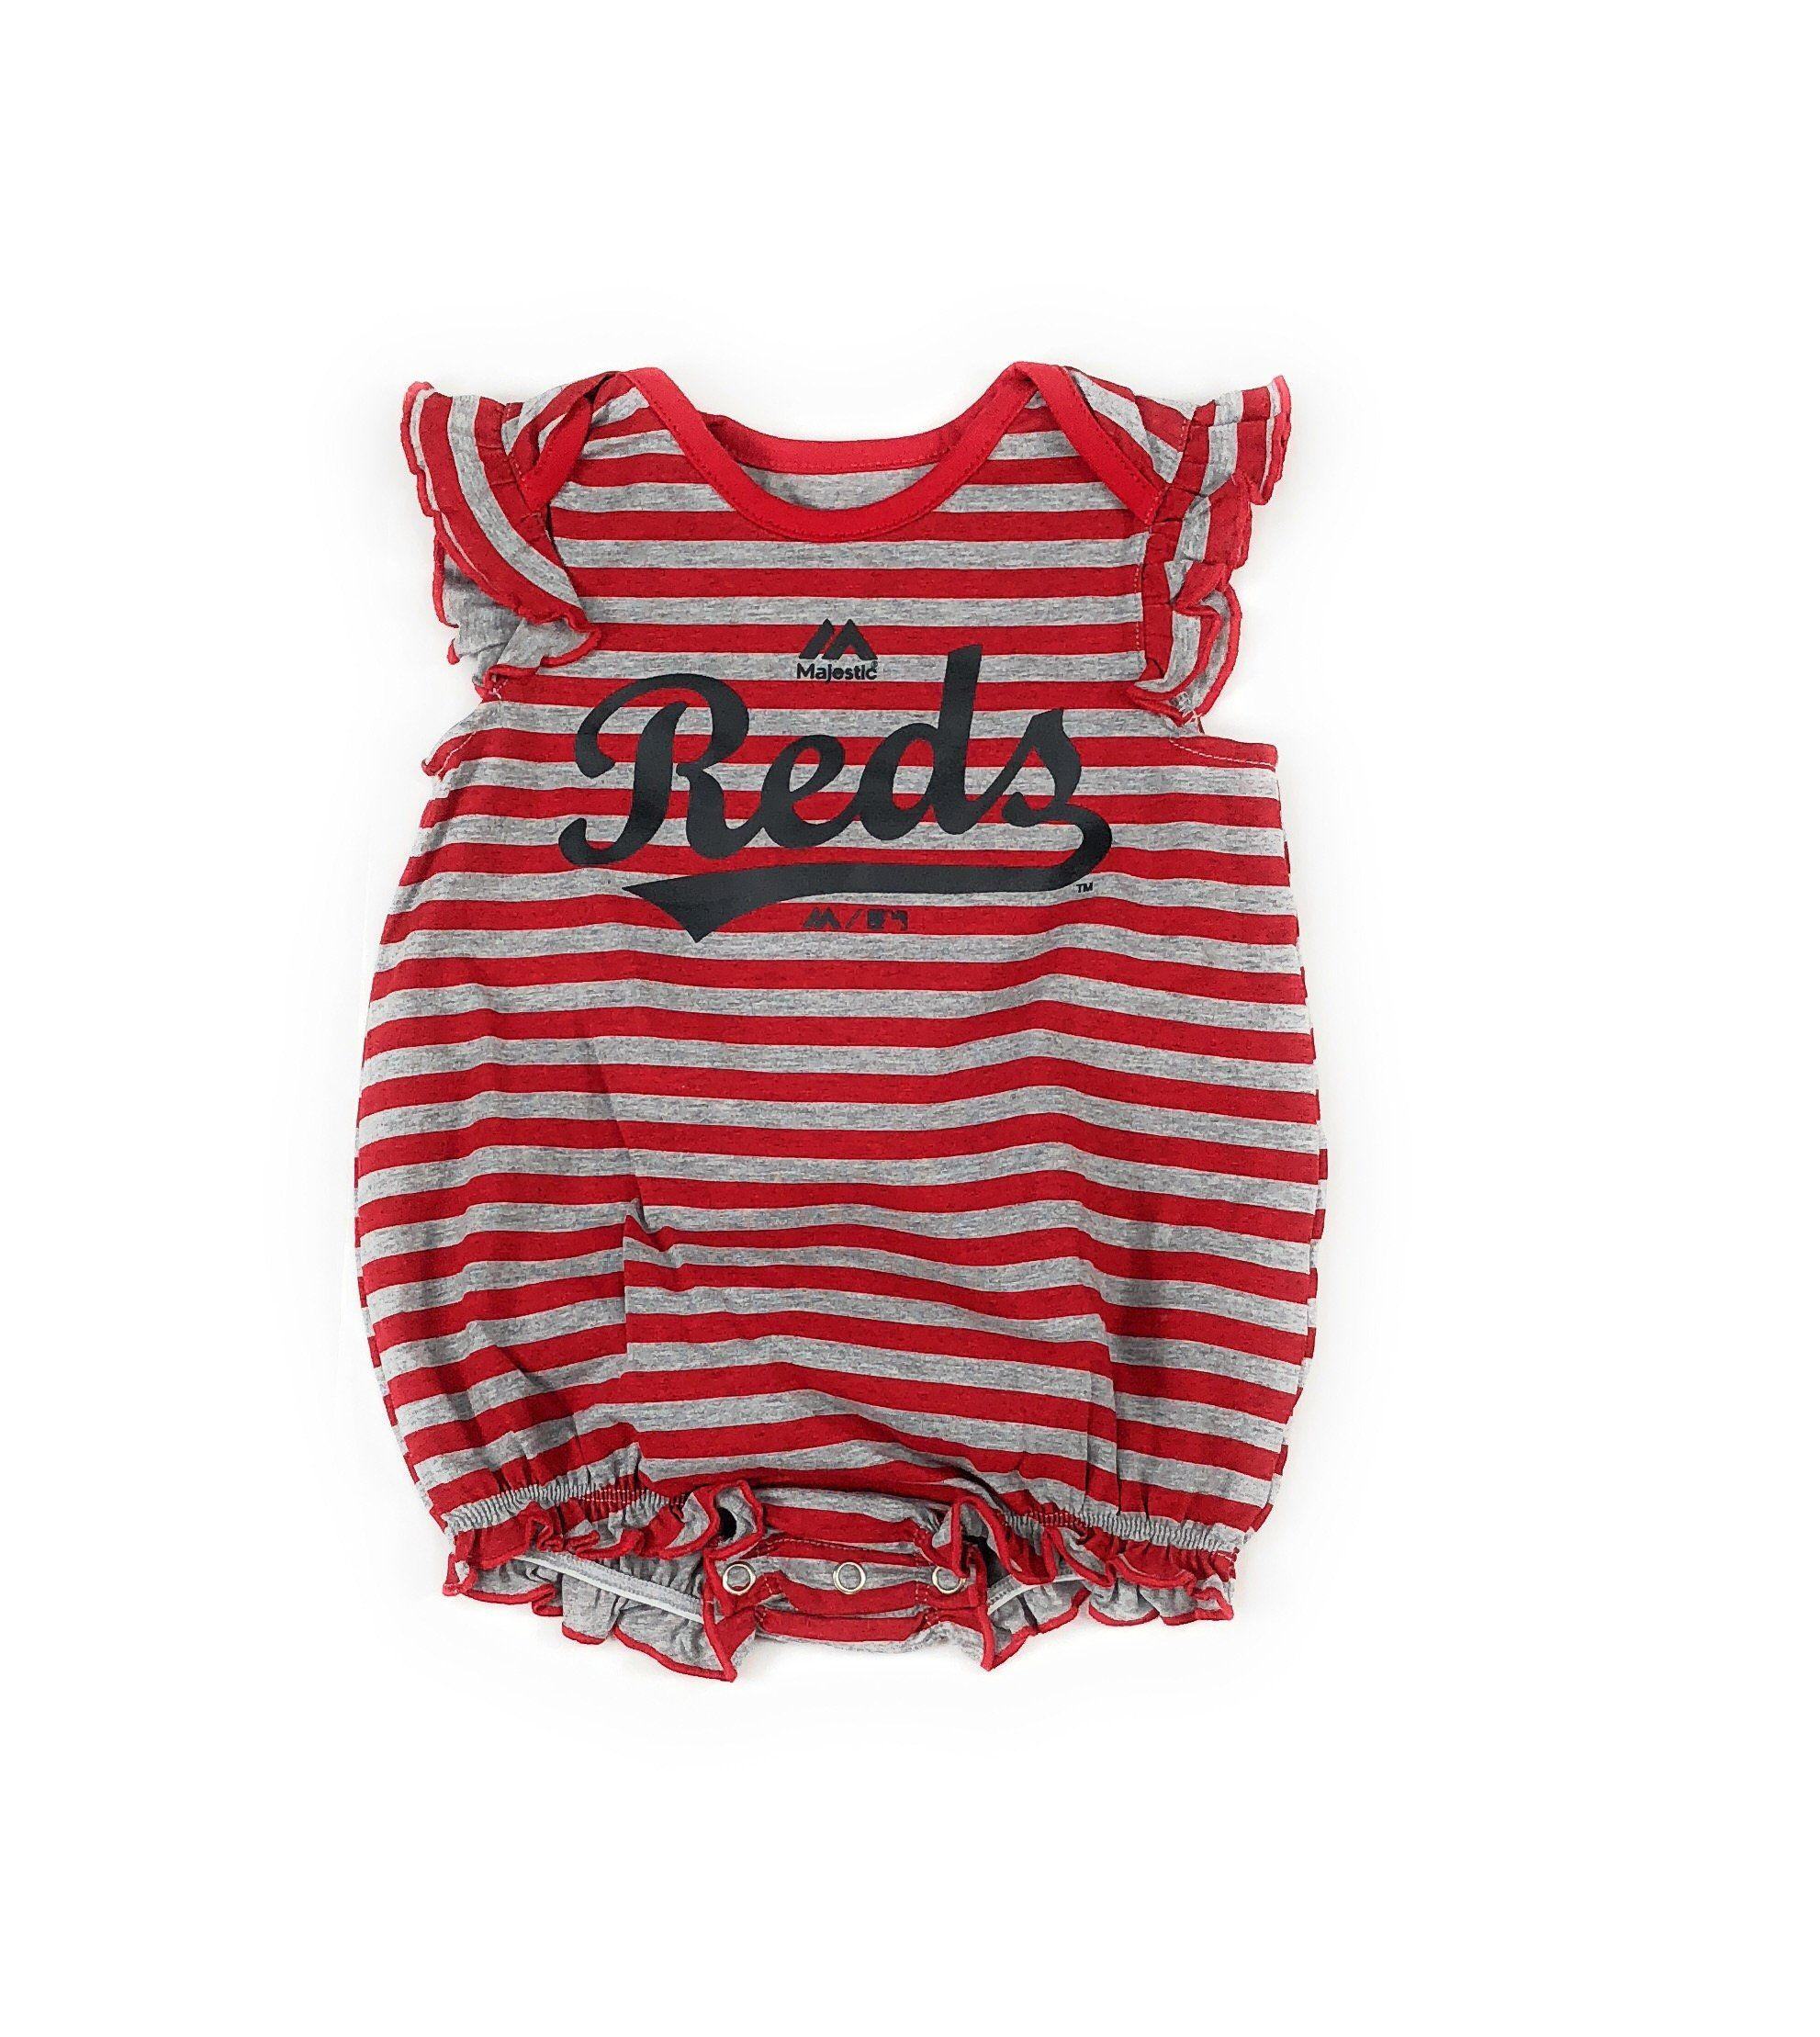 Outerstuff Cincinnati Reds Girls Baby Team Sparkle Clothing Apparel 2 Piece...